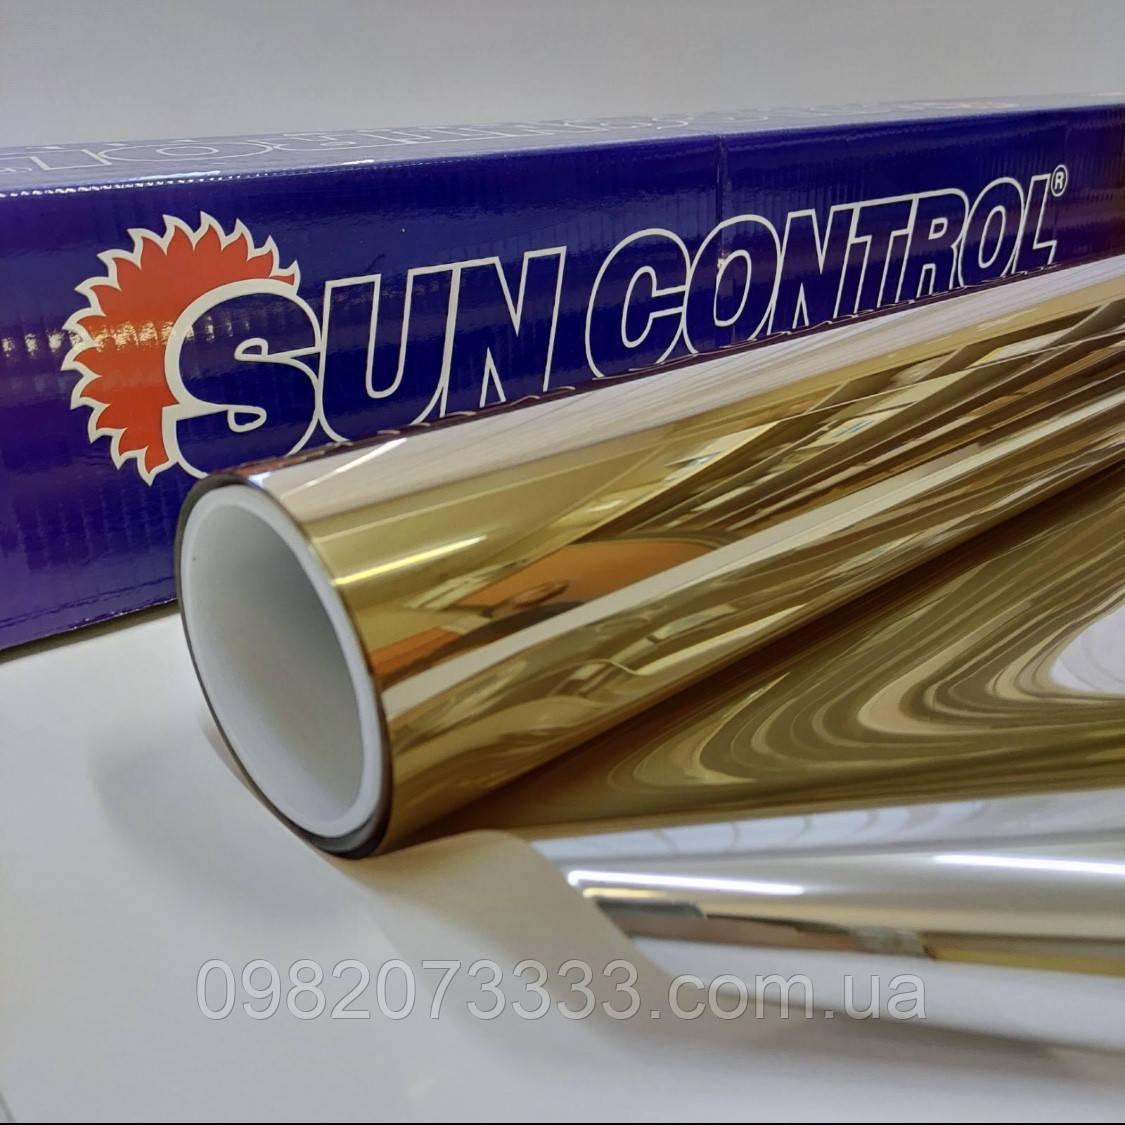 Солнцезащитная R Gold 15 Sun Control зеркальная плёнка для тонировки стекла ширина рулона 1,524 (цена за кв.м)